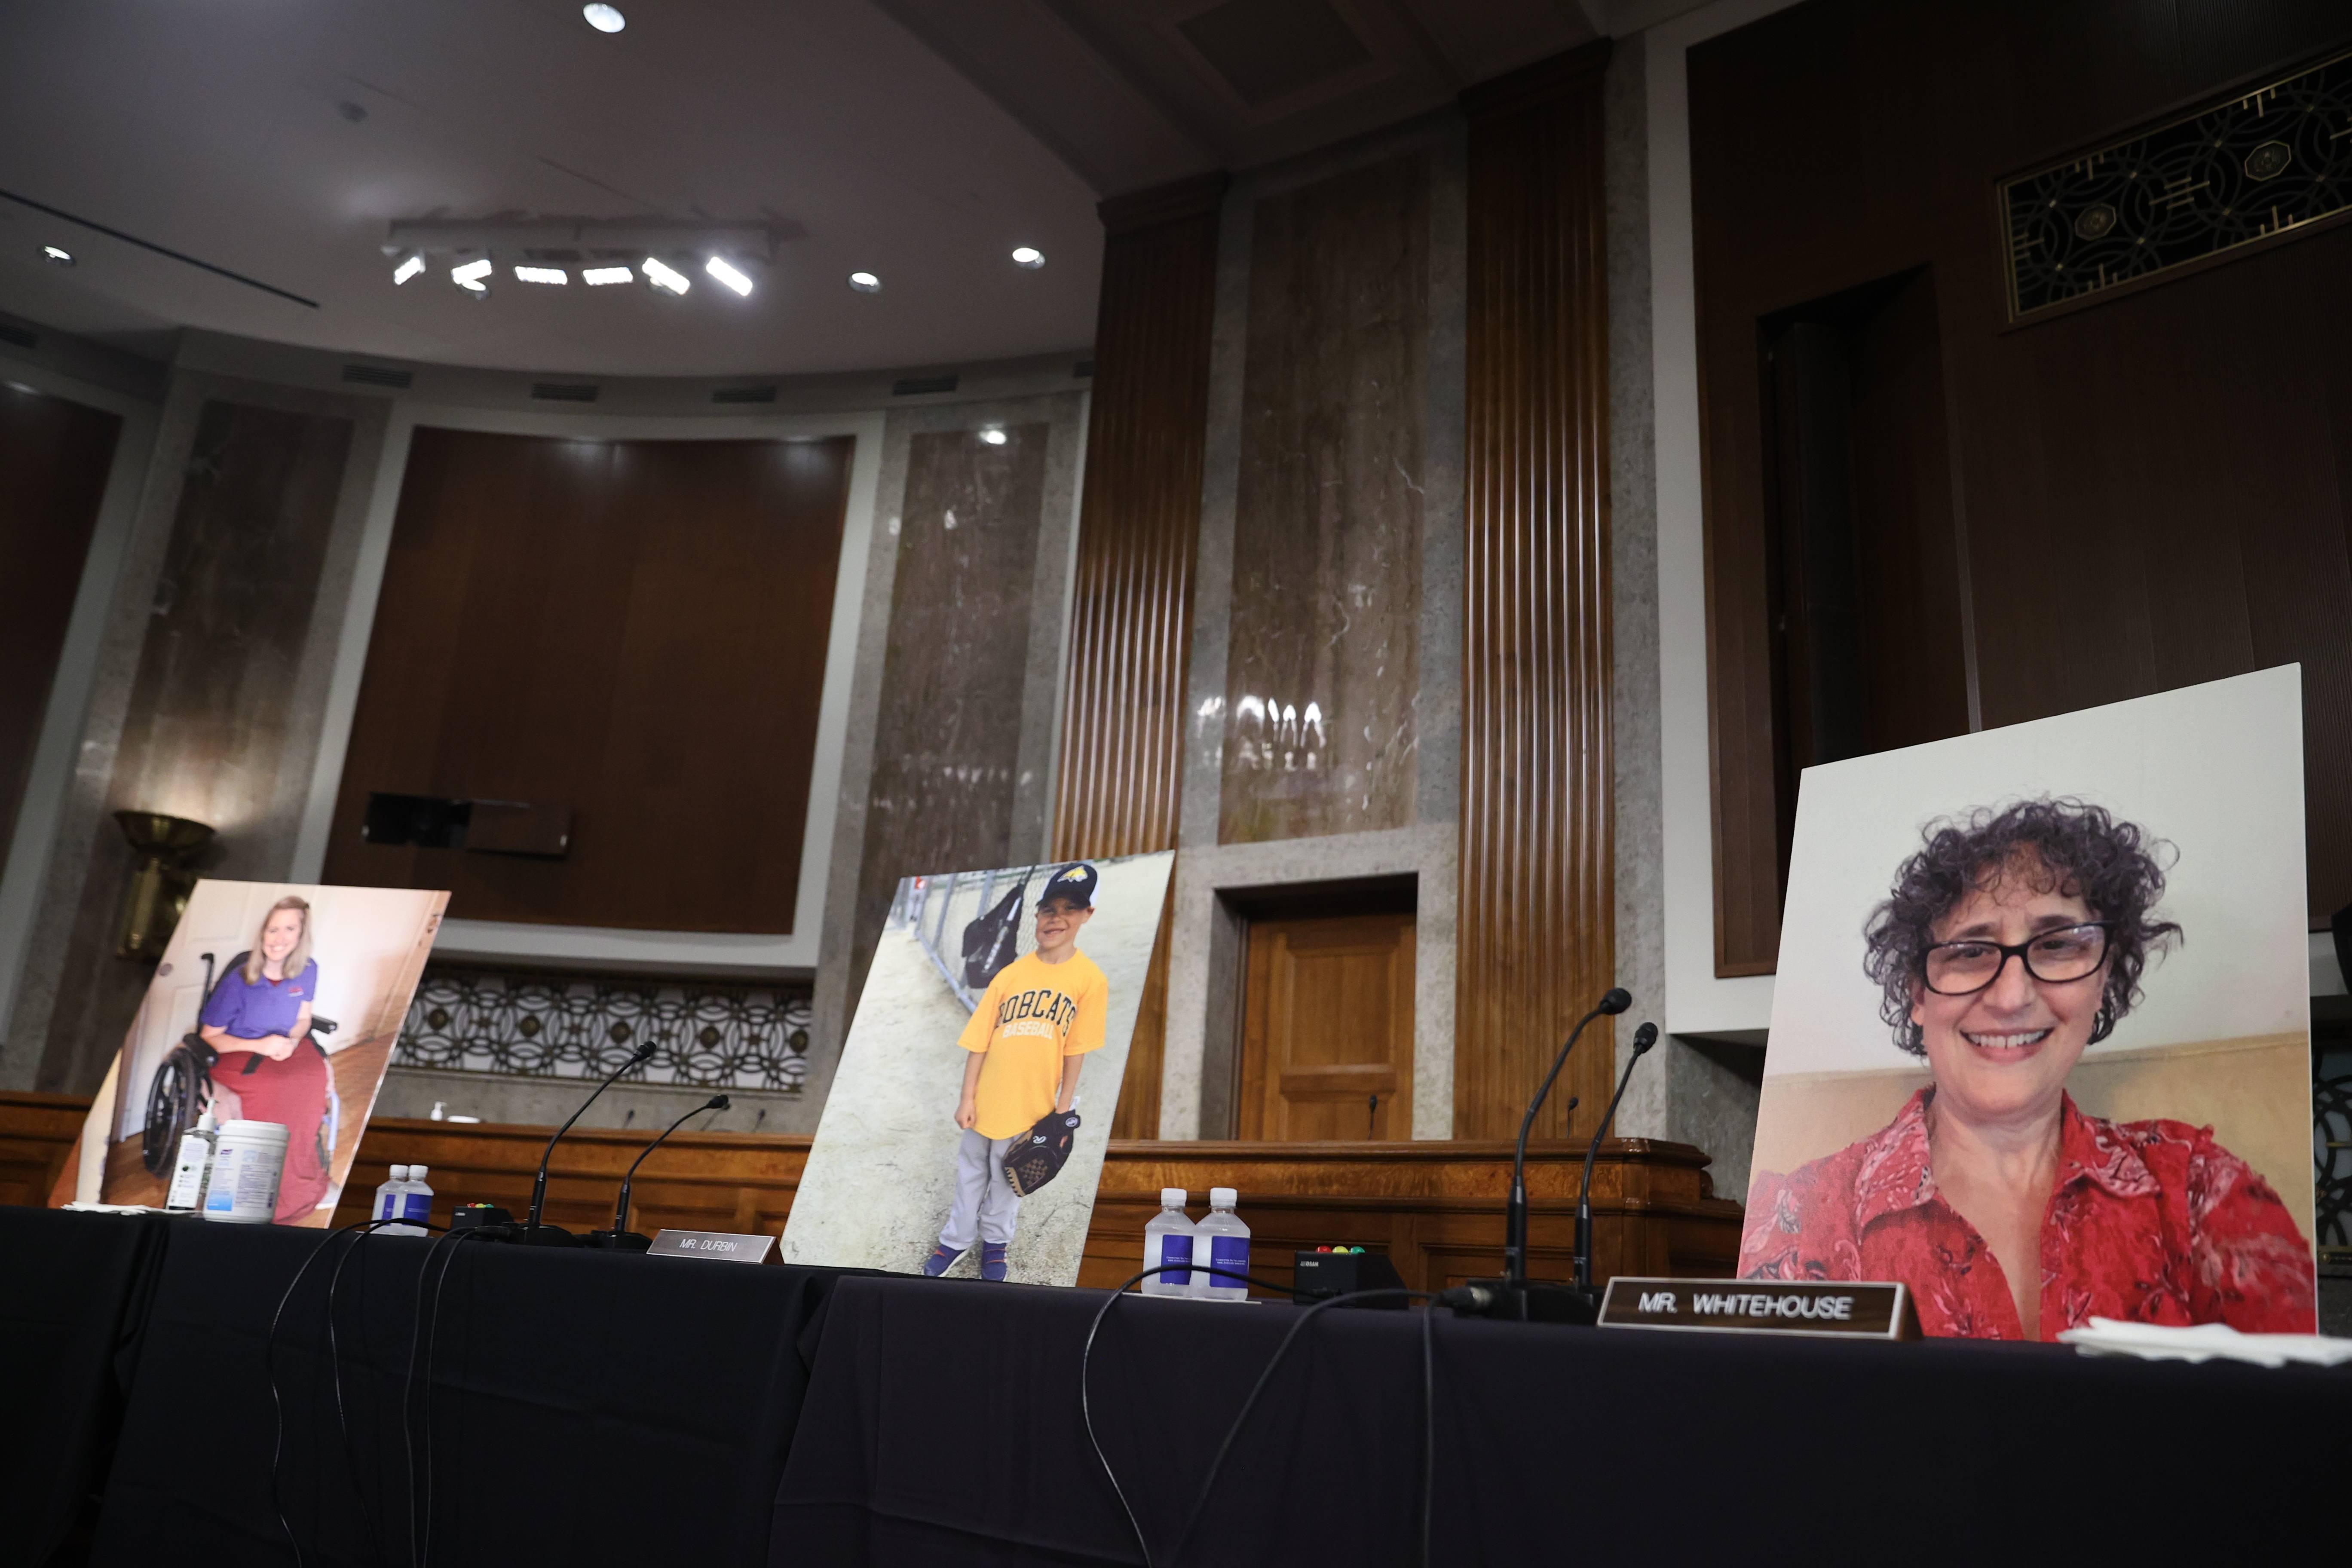 Protesto democrata: Cadeiras dos senadores democratas foram ocupadas por fotos de americanos que se beneficiaram do Obamacare   Foto: Hannah McKay/Pool/Getty Images/AFP